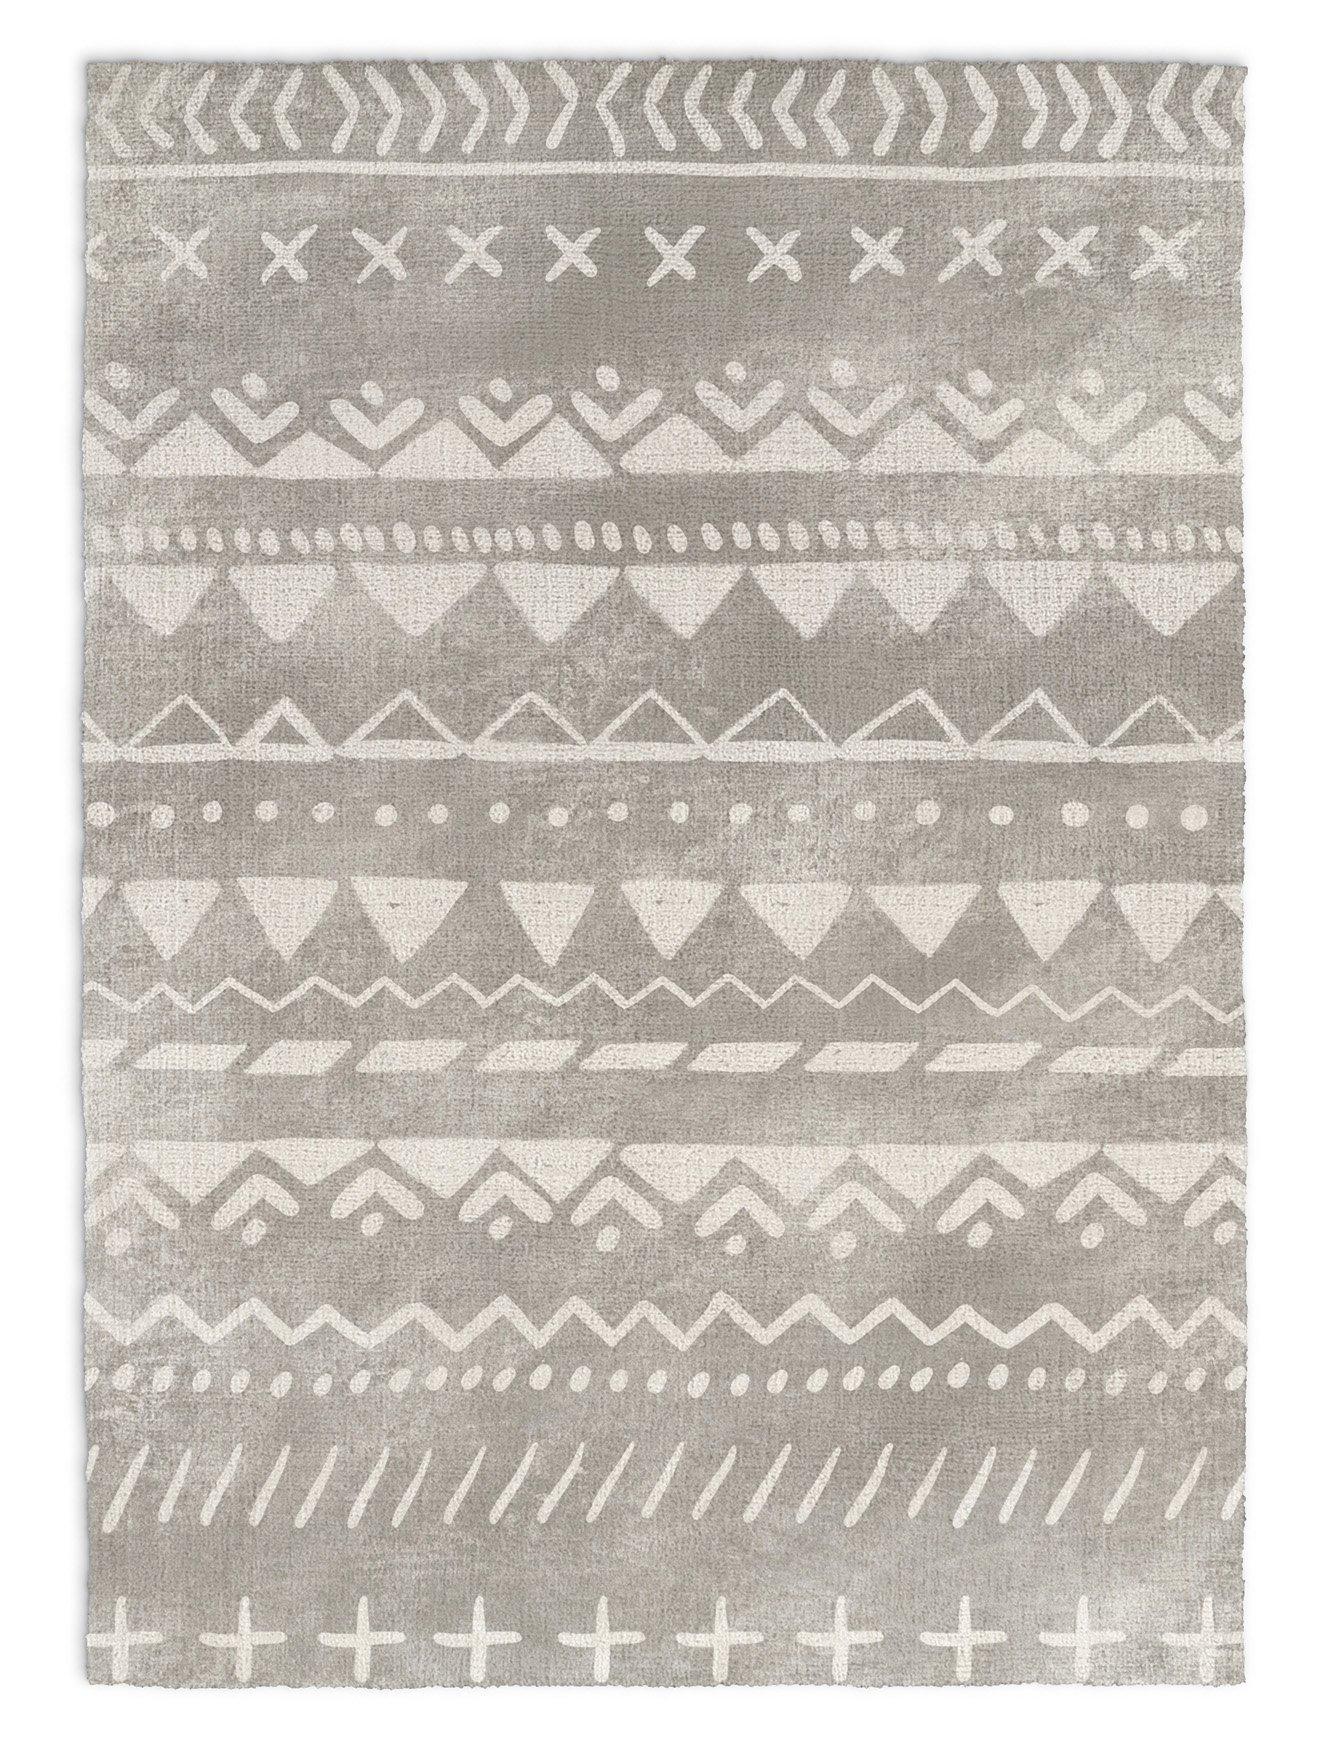 KAVKA Designs Fox Rug Area Rug, (Grey/White) - , Size: 3x5x.5 - (JLJAVC045RUG35)